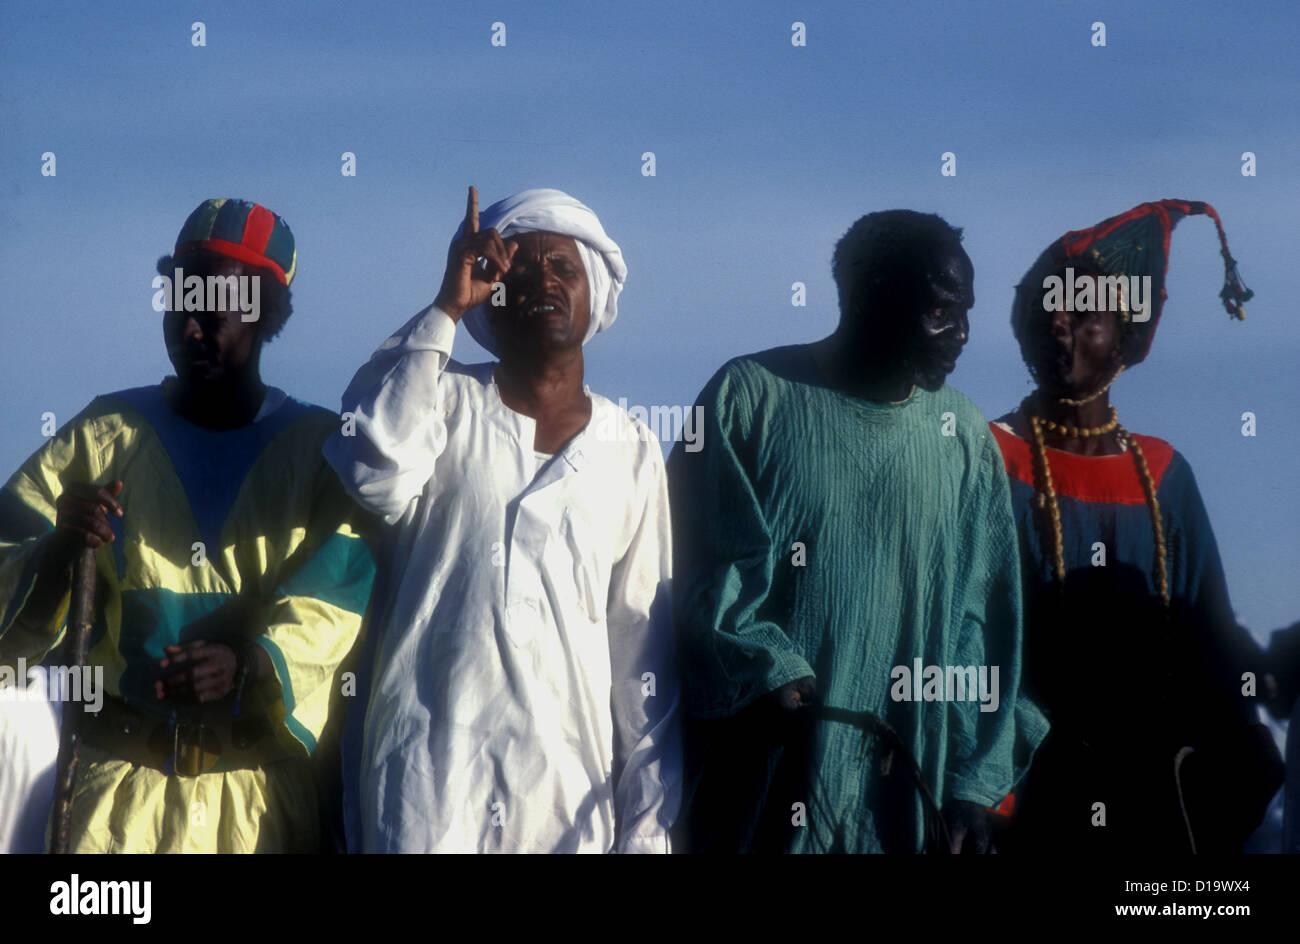 Dervish or Sufi dancers in Omdurman Sudan - Stock Image